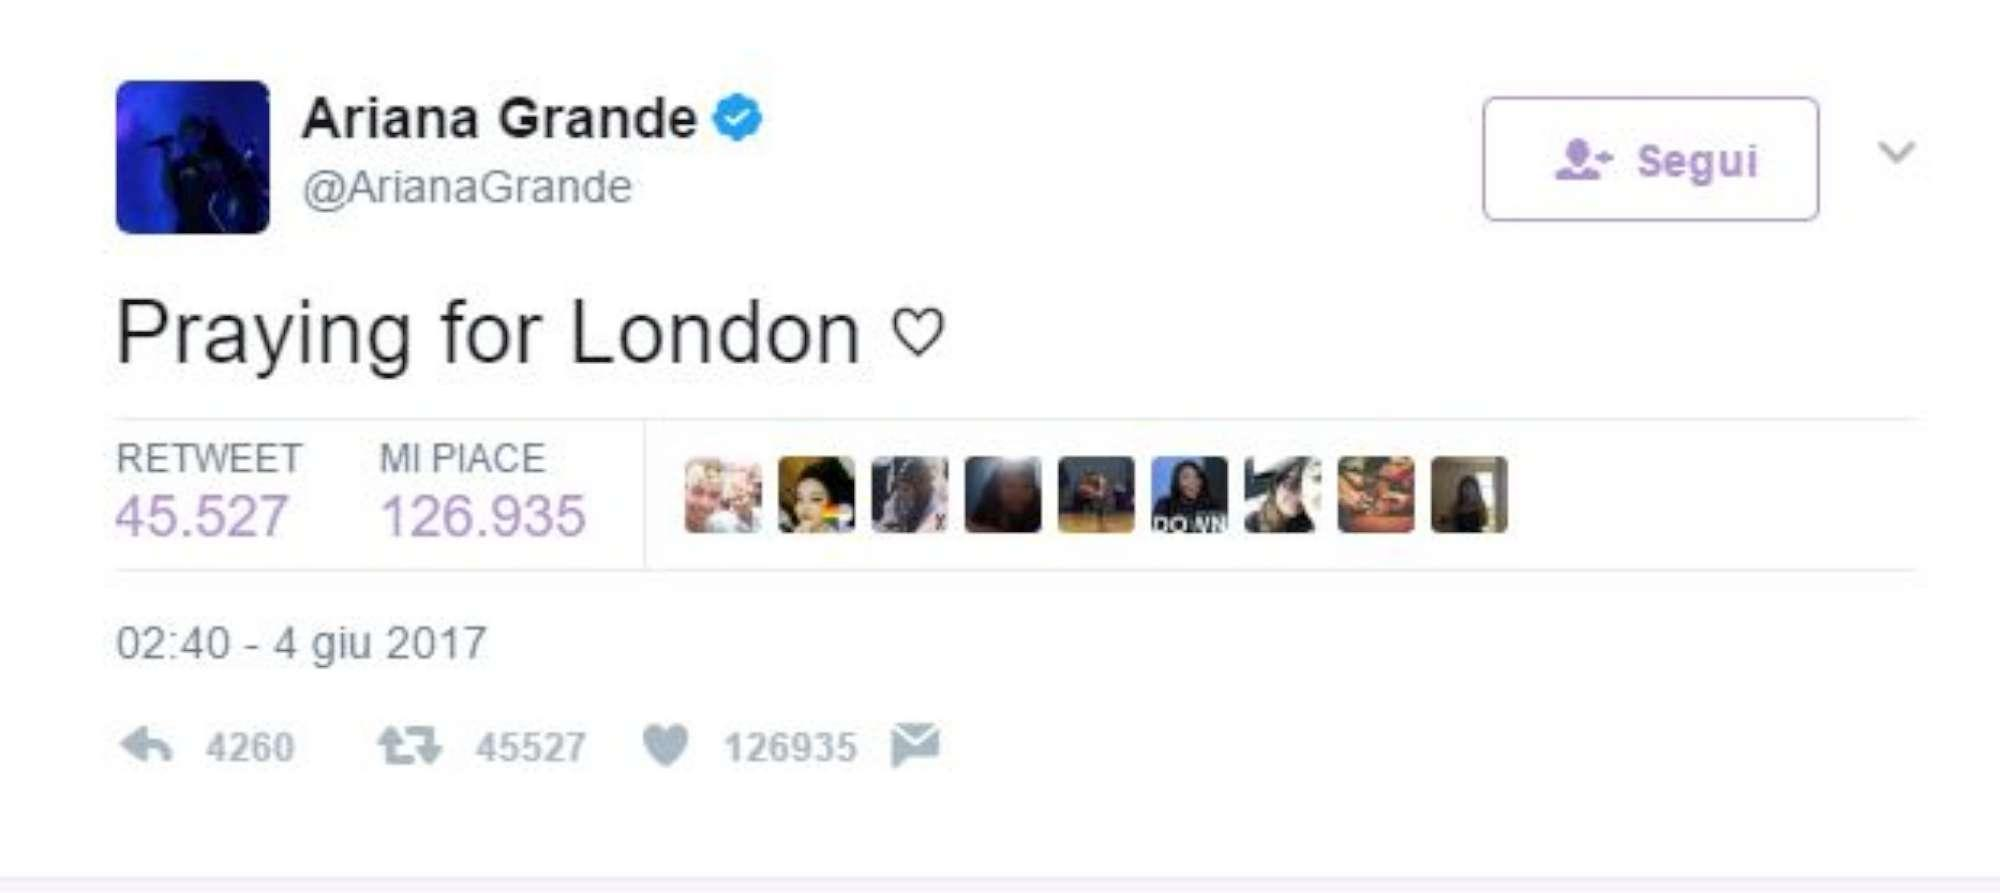 Attacchi a Londra, Ariana Grande da Manchester:  Prego per voi